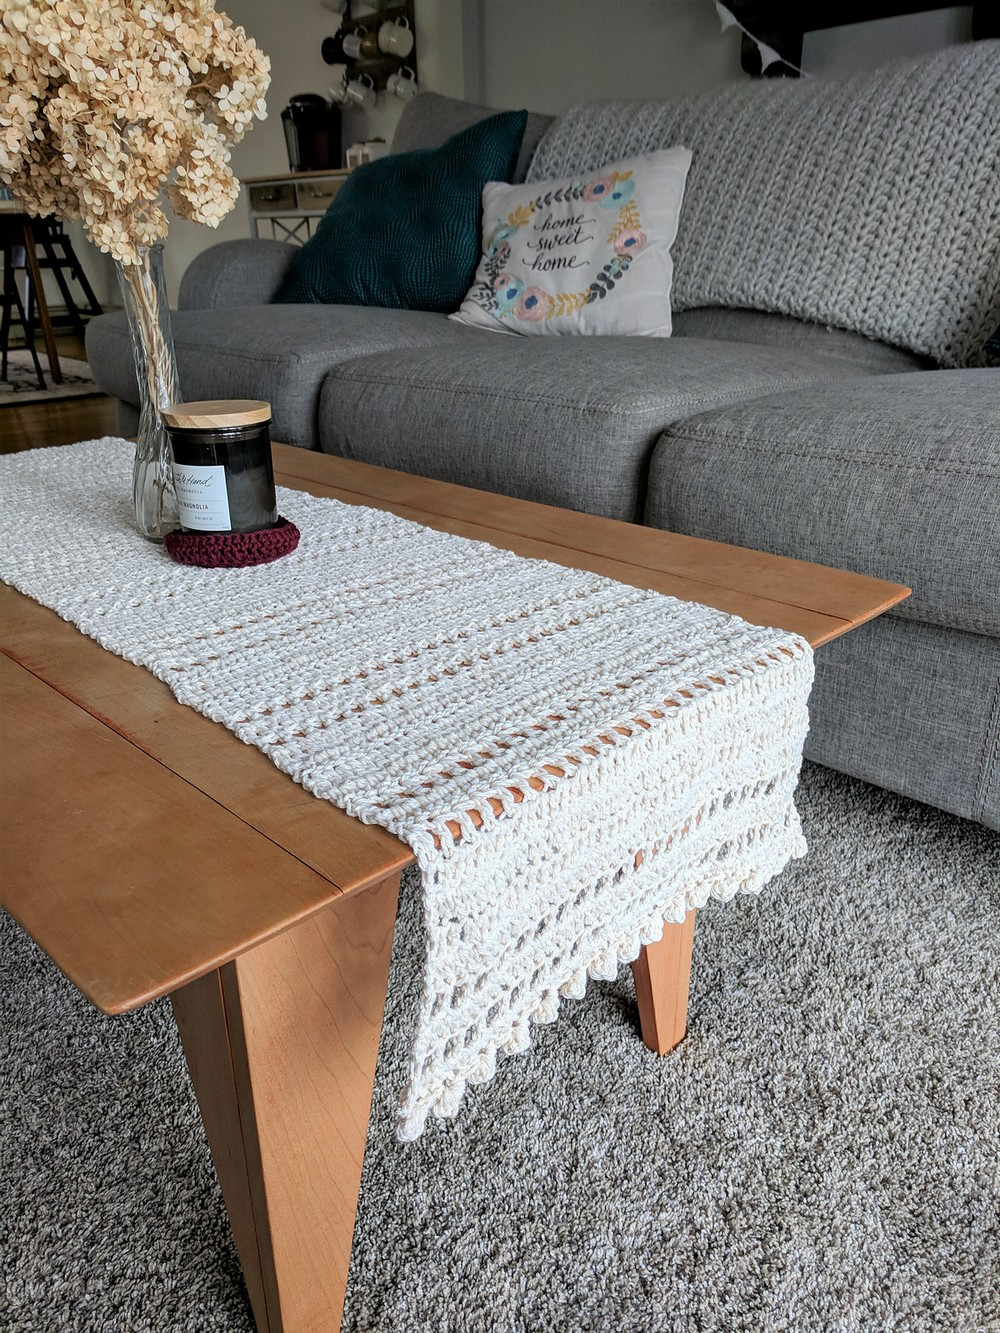 Free Crochet Home Sweet Home Table Runner Pattern